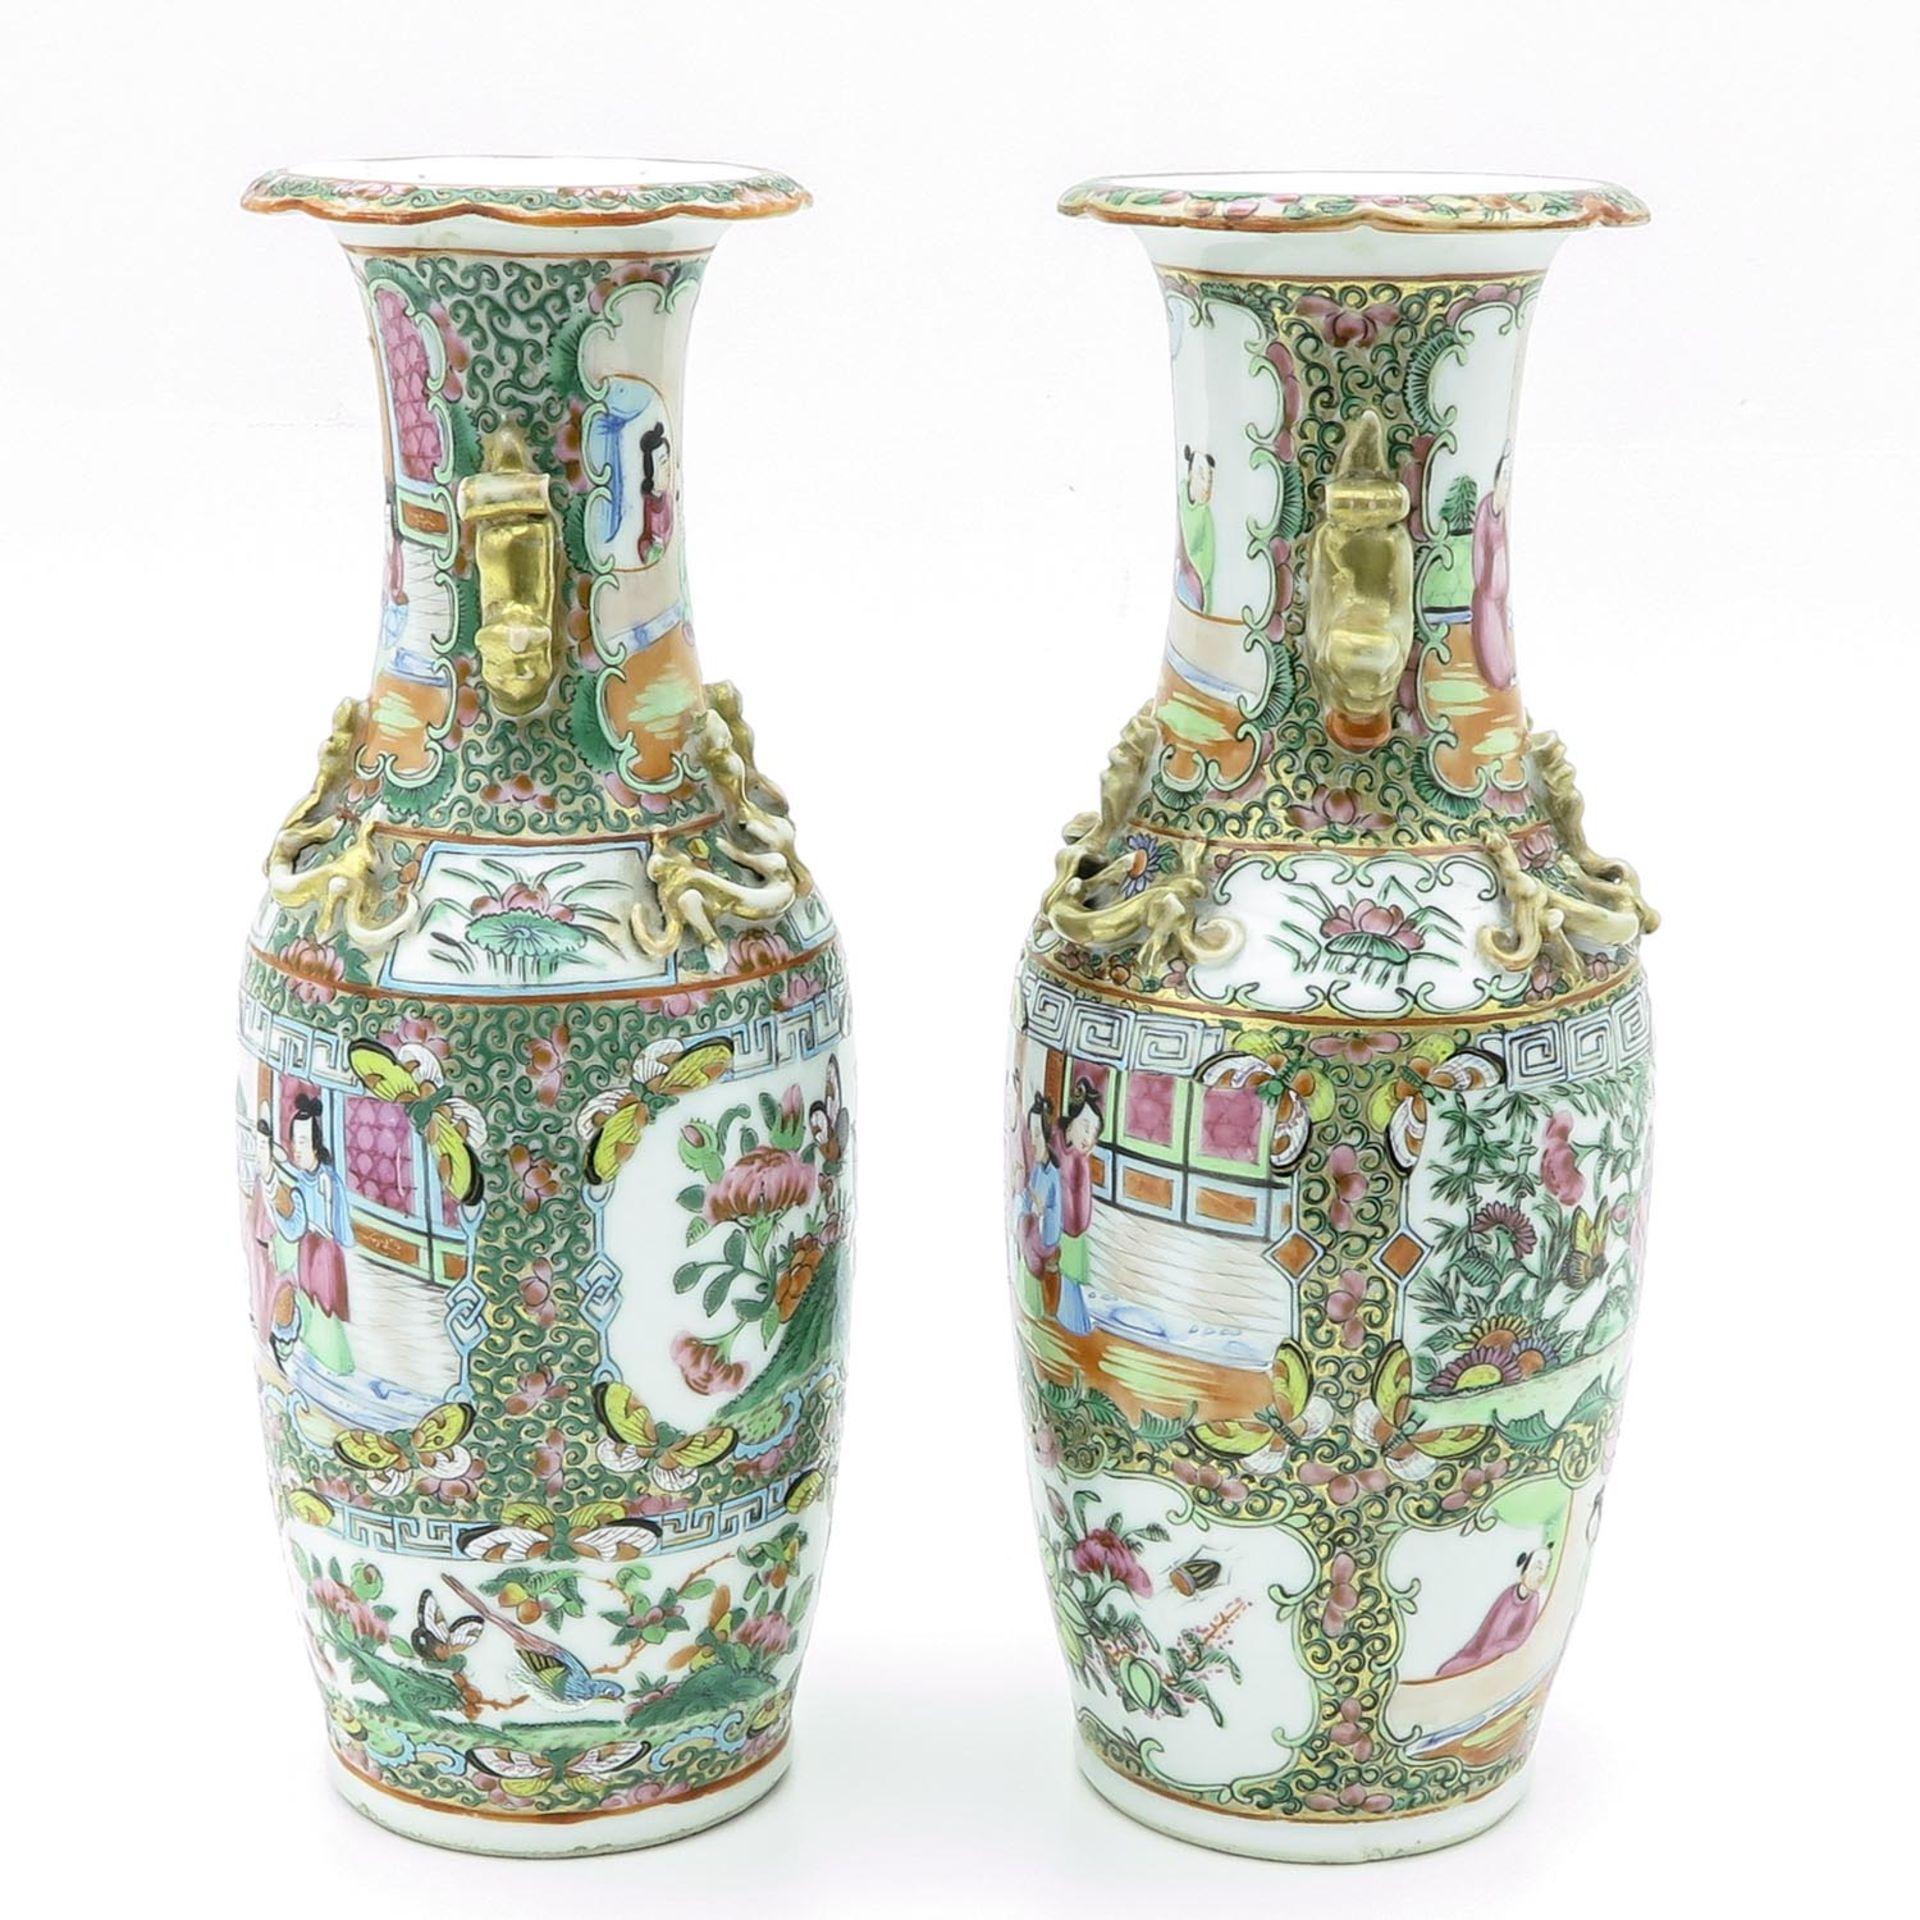 Los 7036 - A Pair of Cantonese Vases